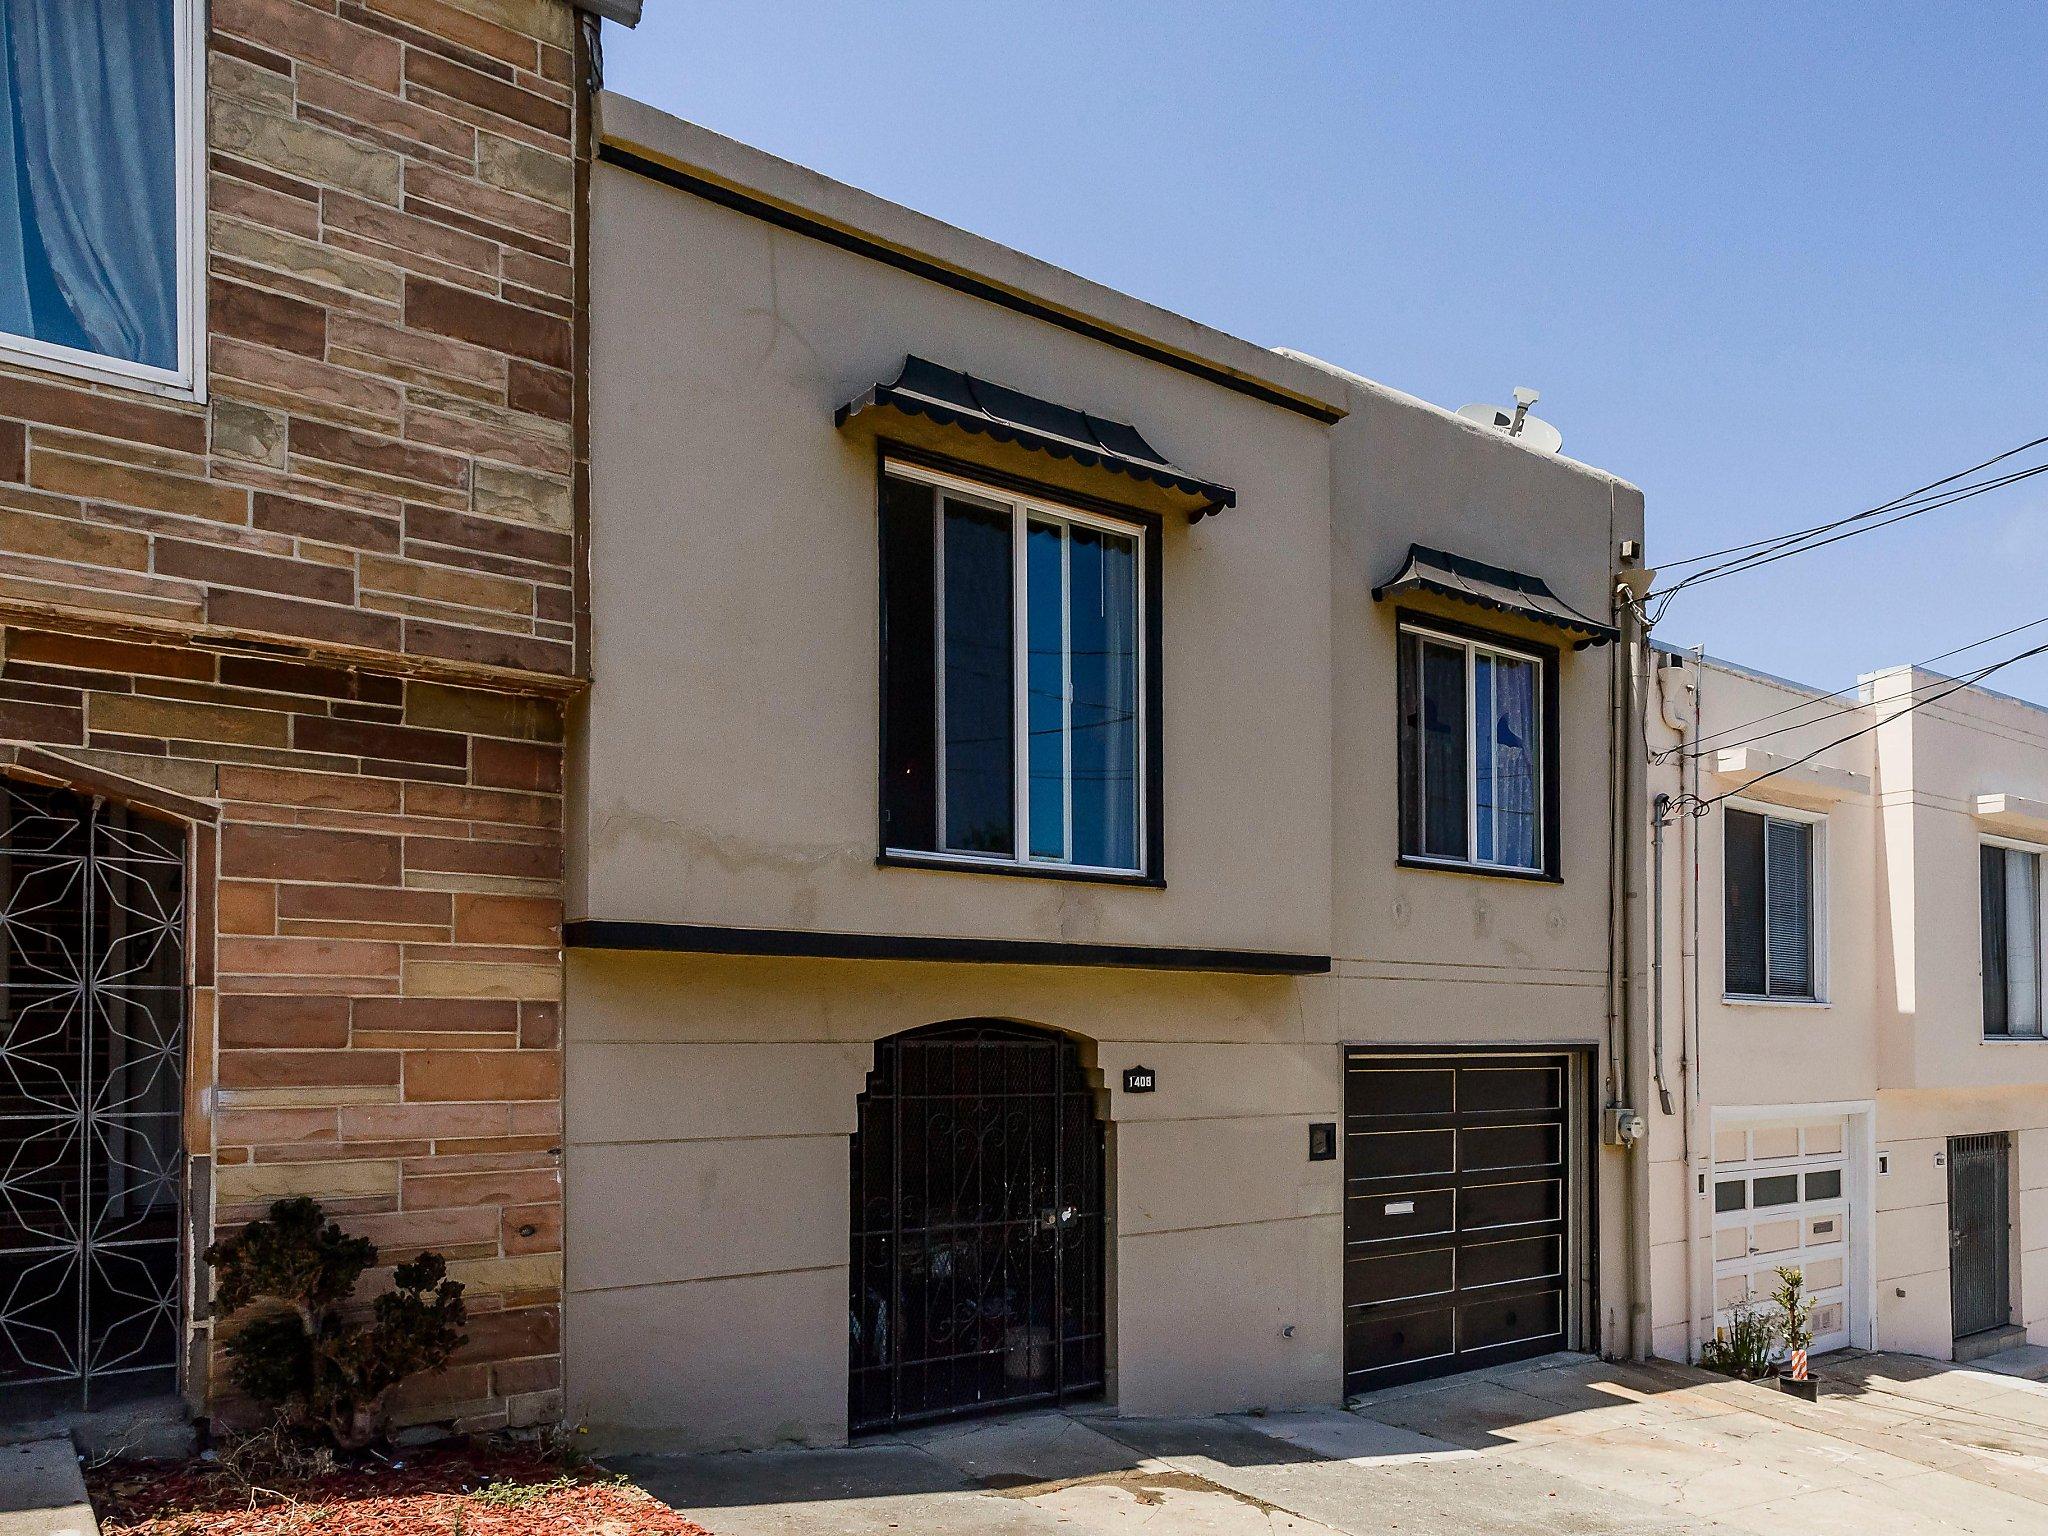 Three Bedroom In San Francisco S Silver Terrace Neighborhood Open Sunday San Antonio Express News